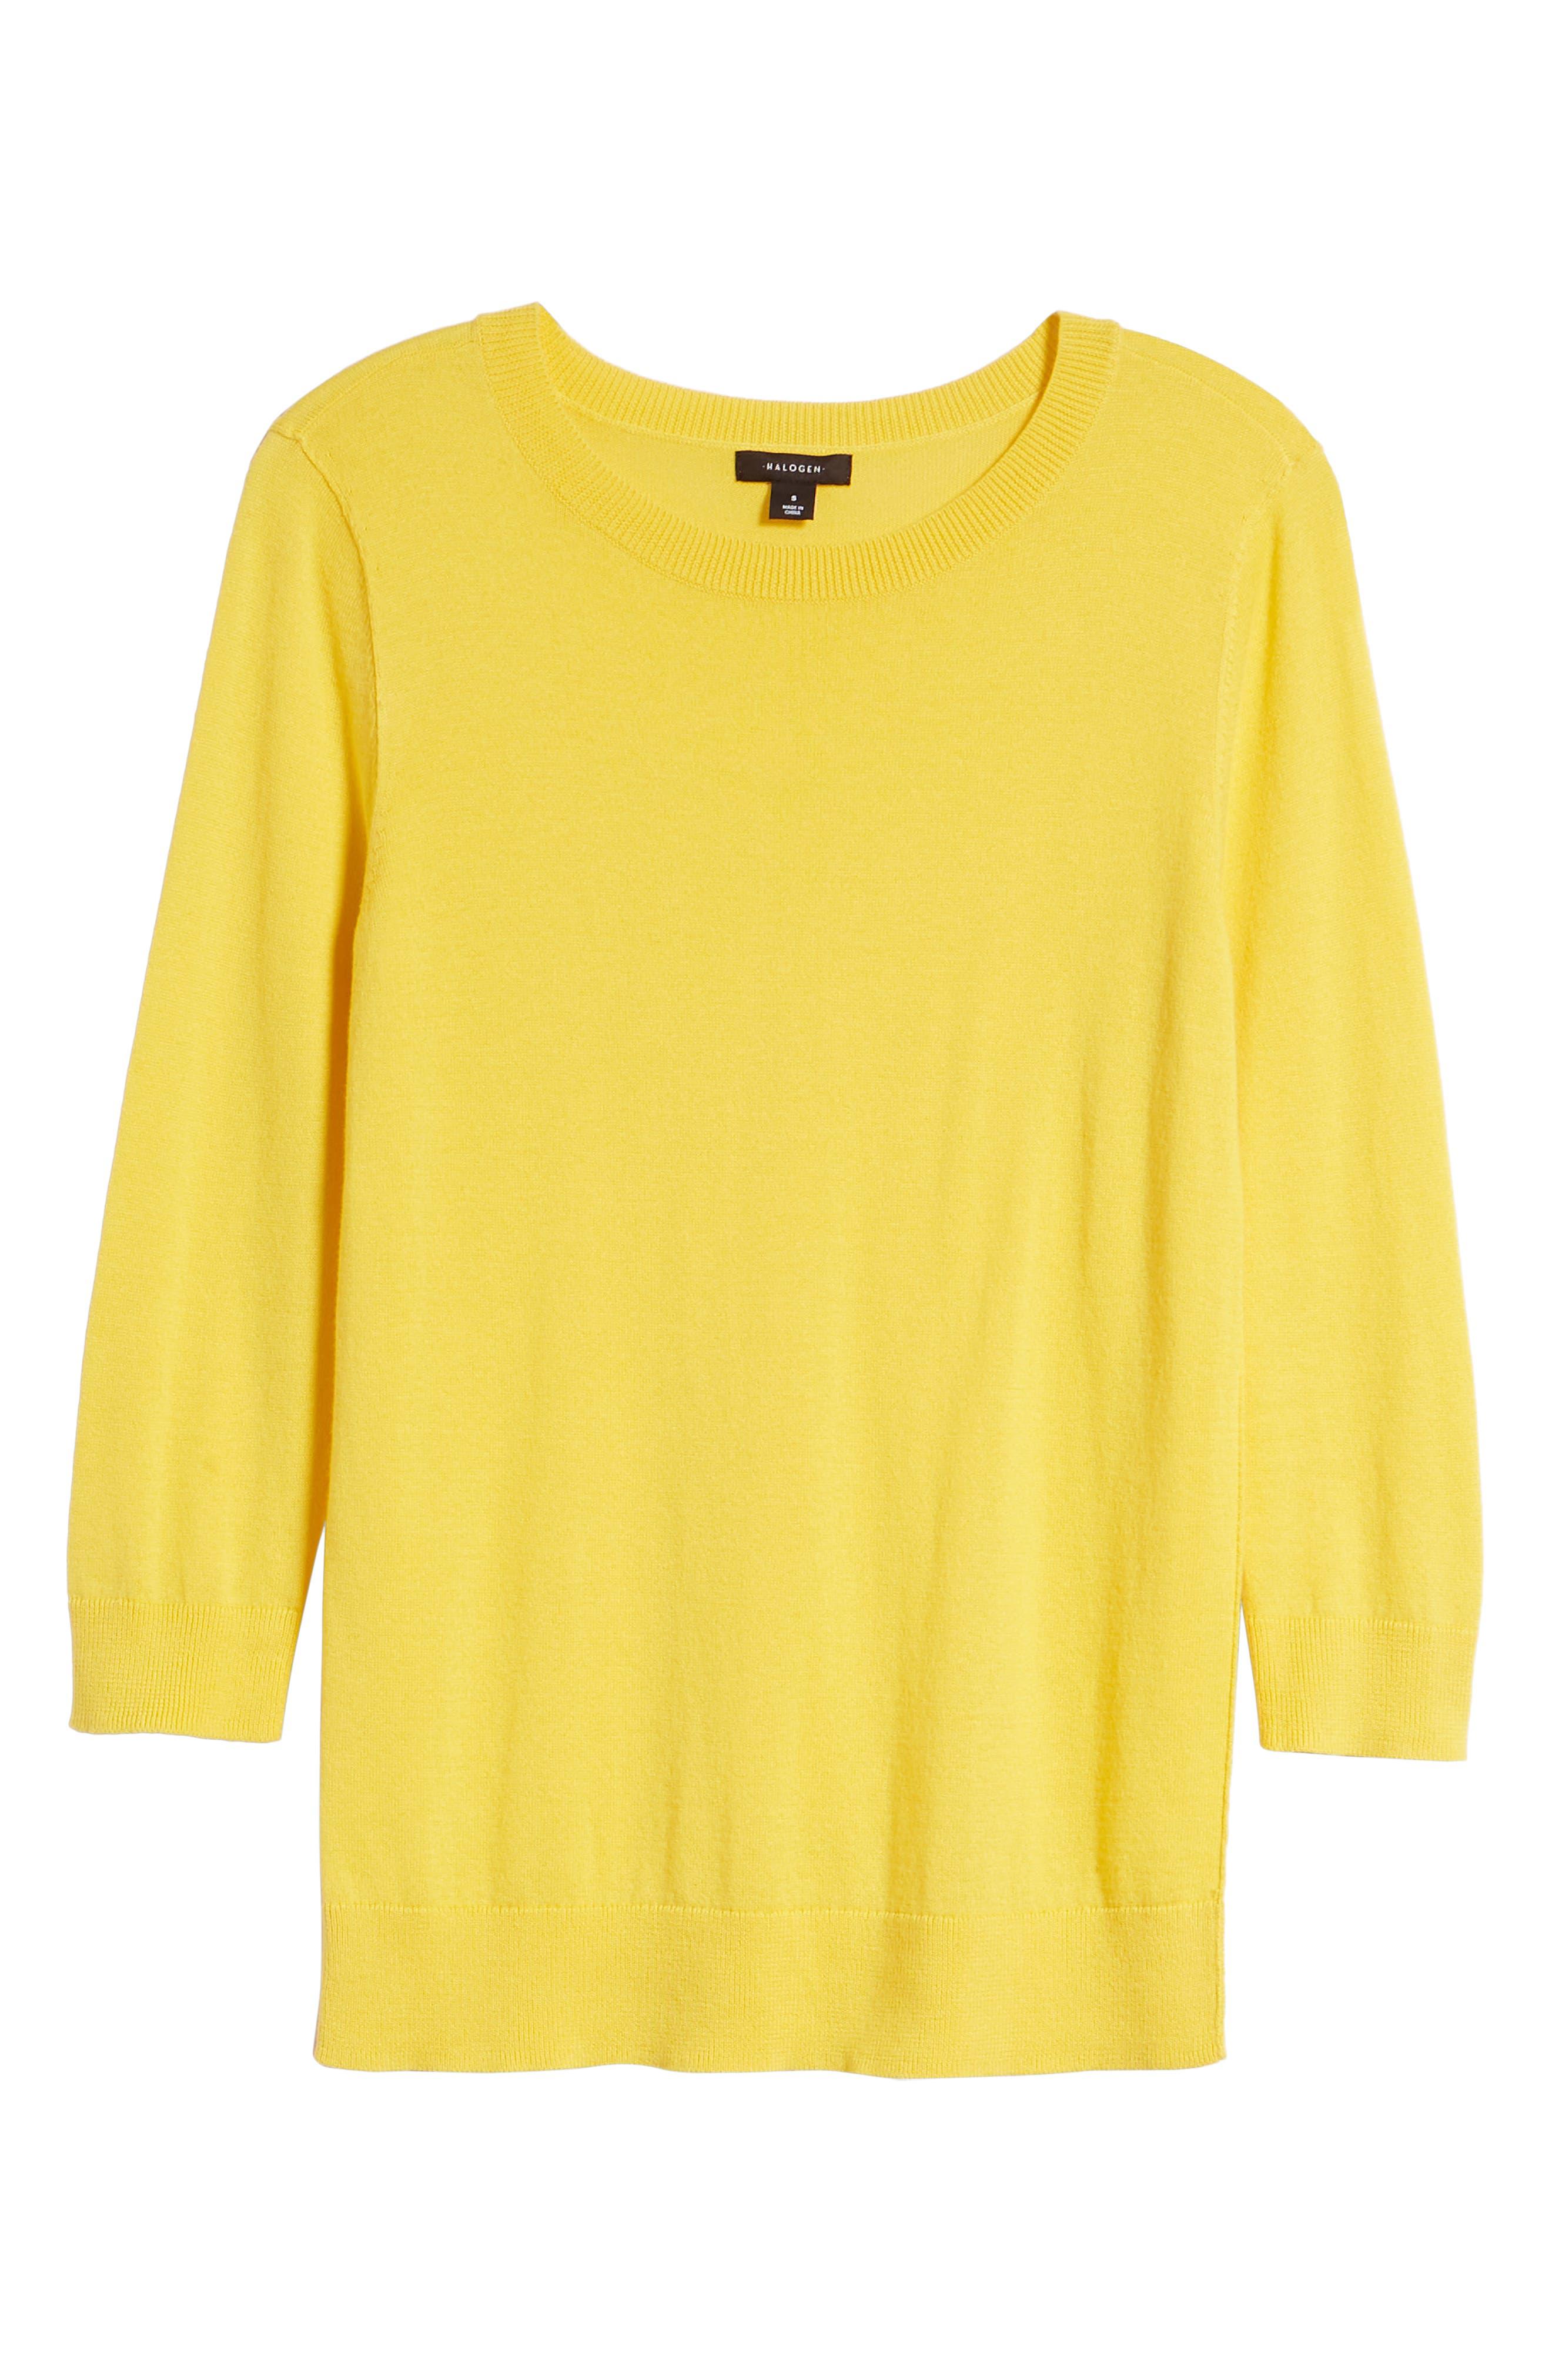 Cotton Blend Pullover,                             Alternate thumbnail 155, color,